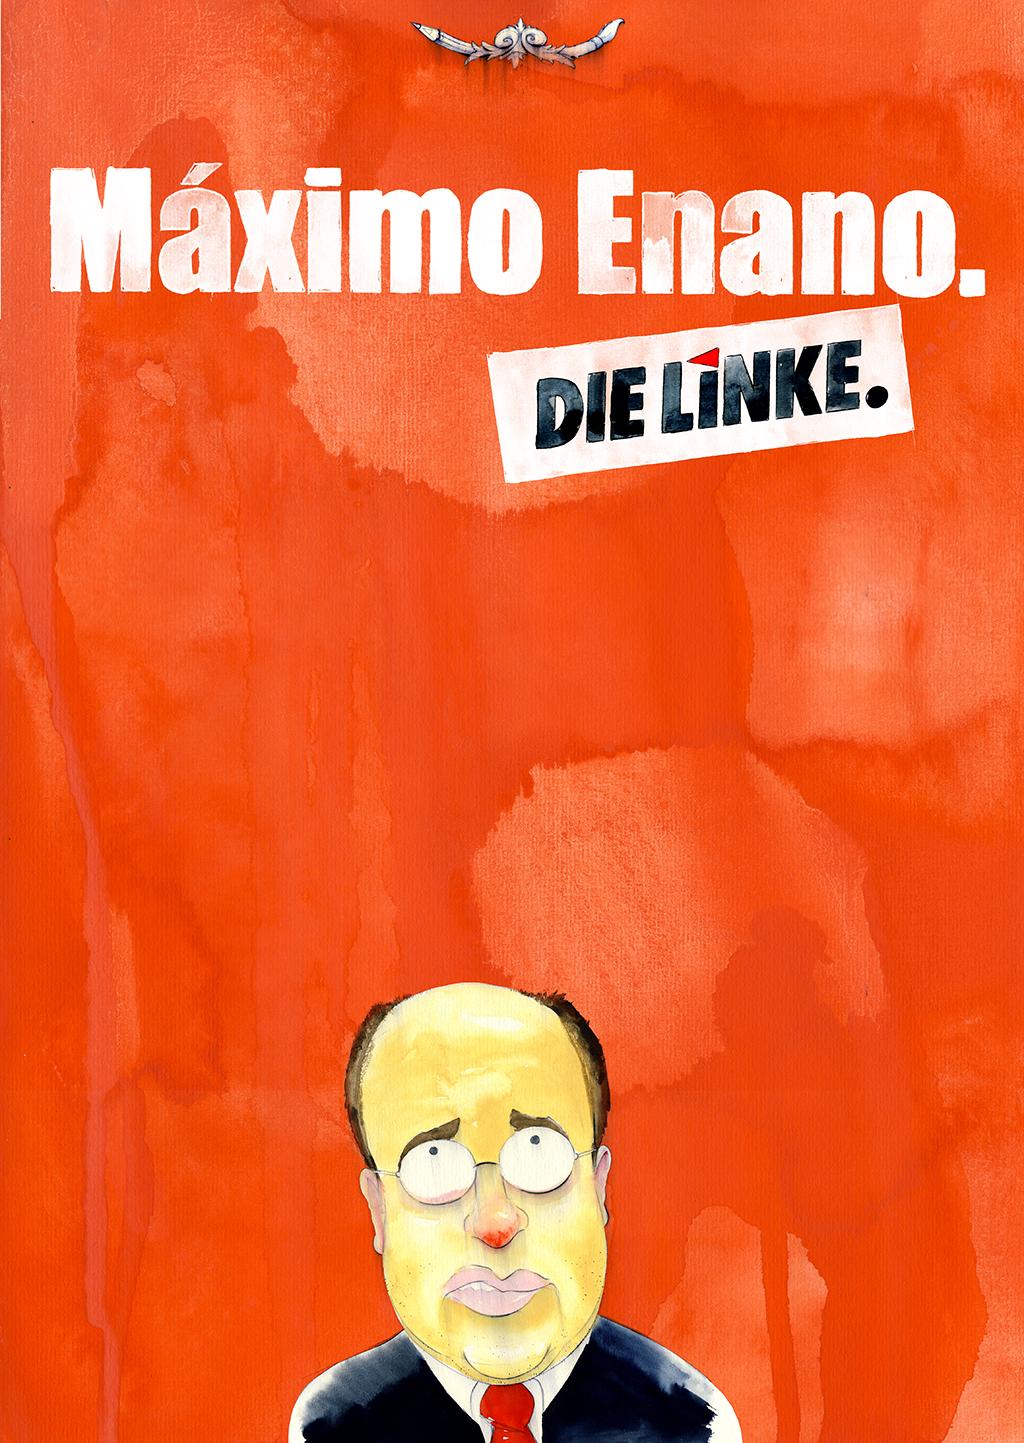 linke_wahlplakat_01_geshwister